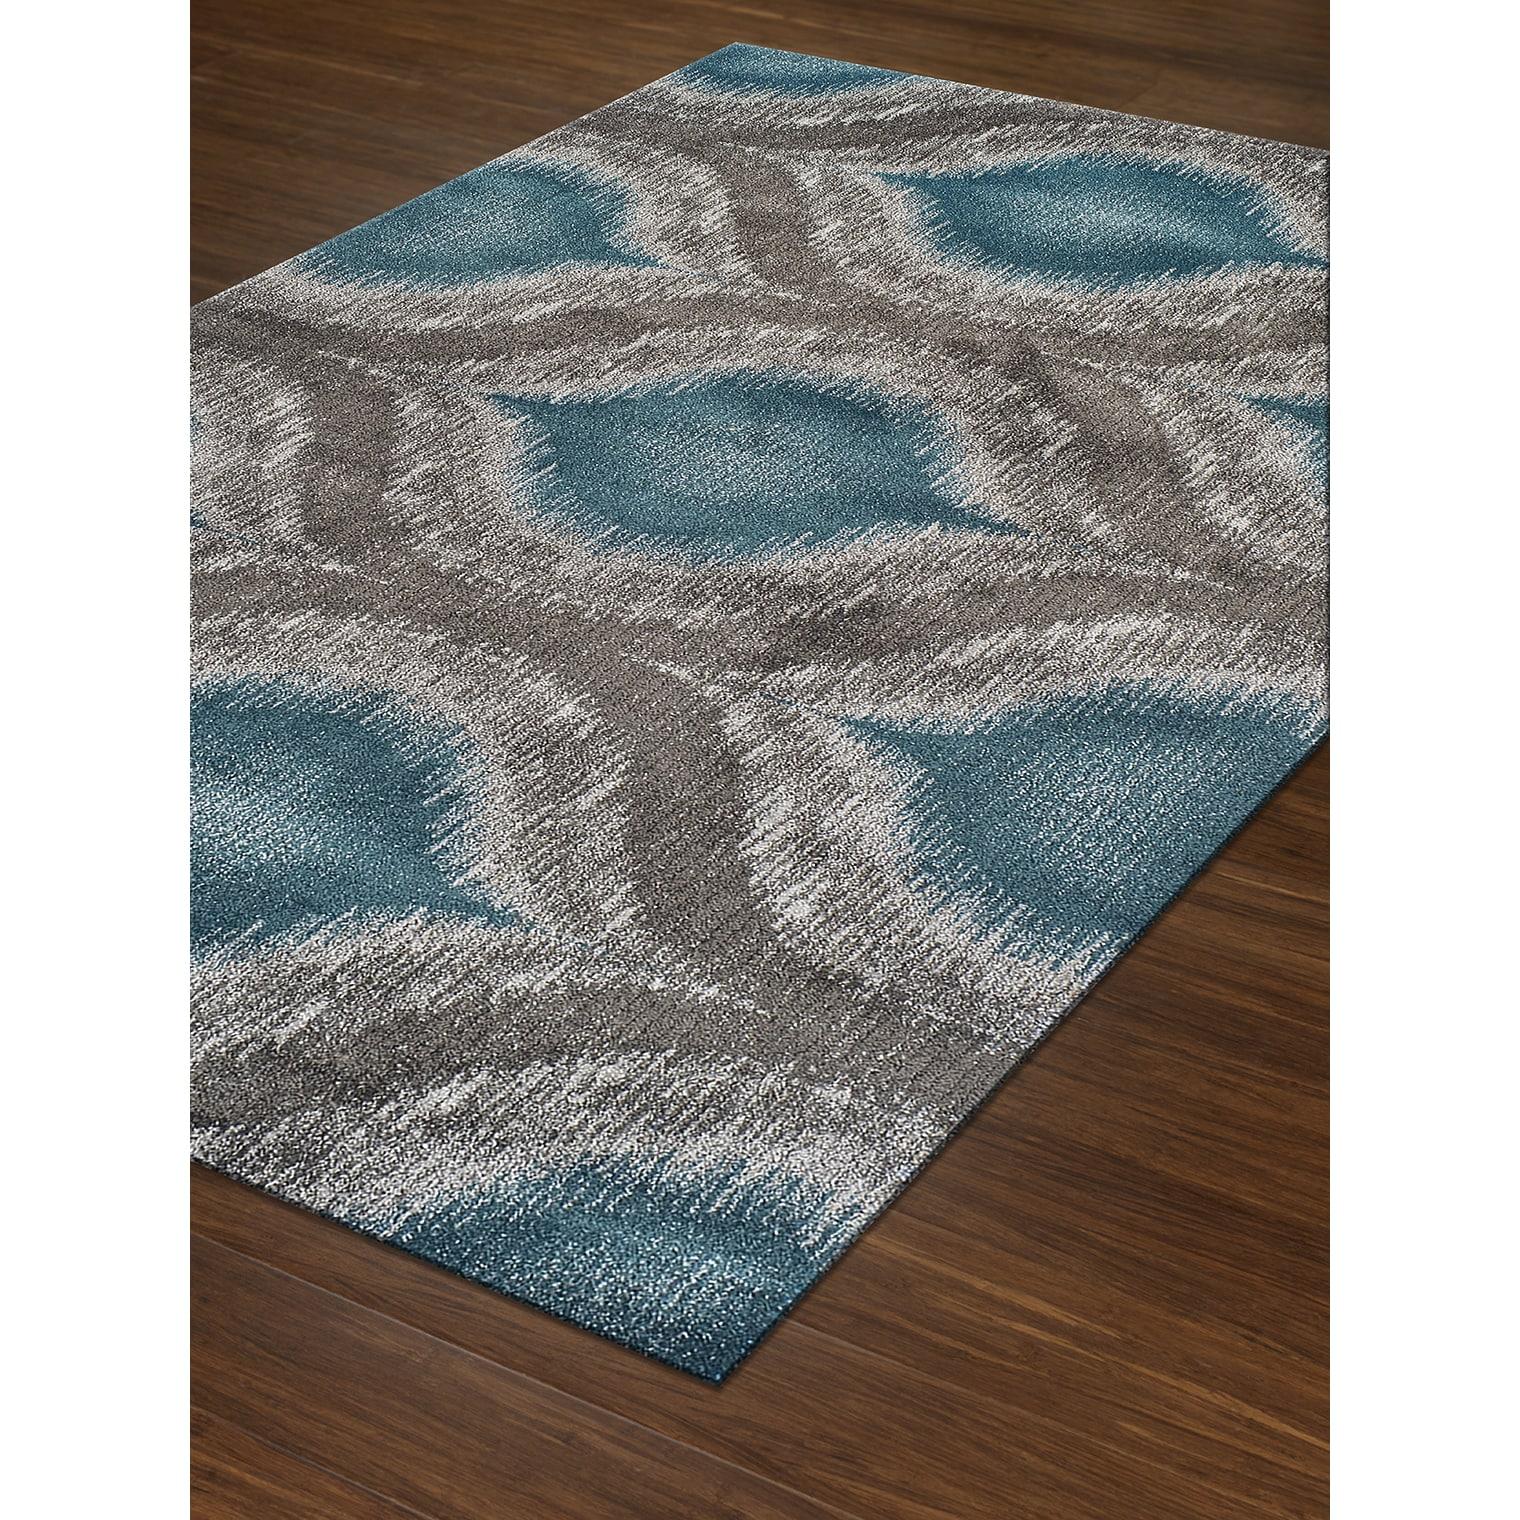 new com rug bath products peacock flandb dynasty linen habidecor bathroom